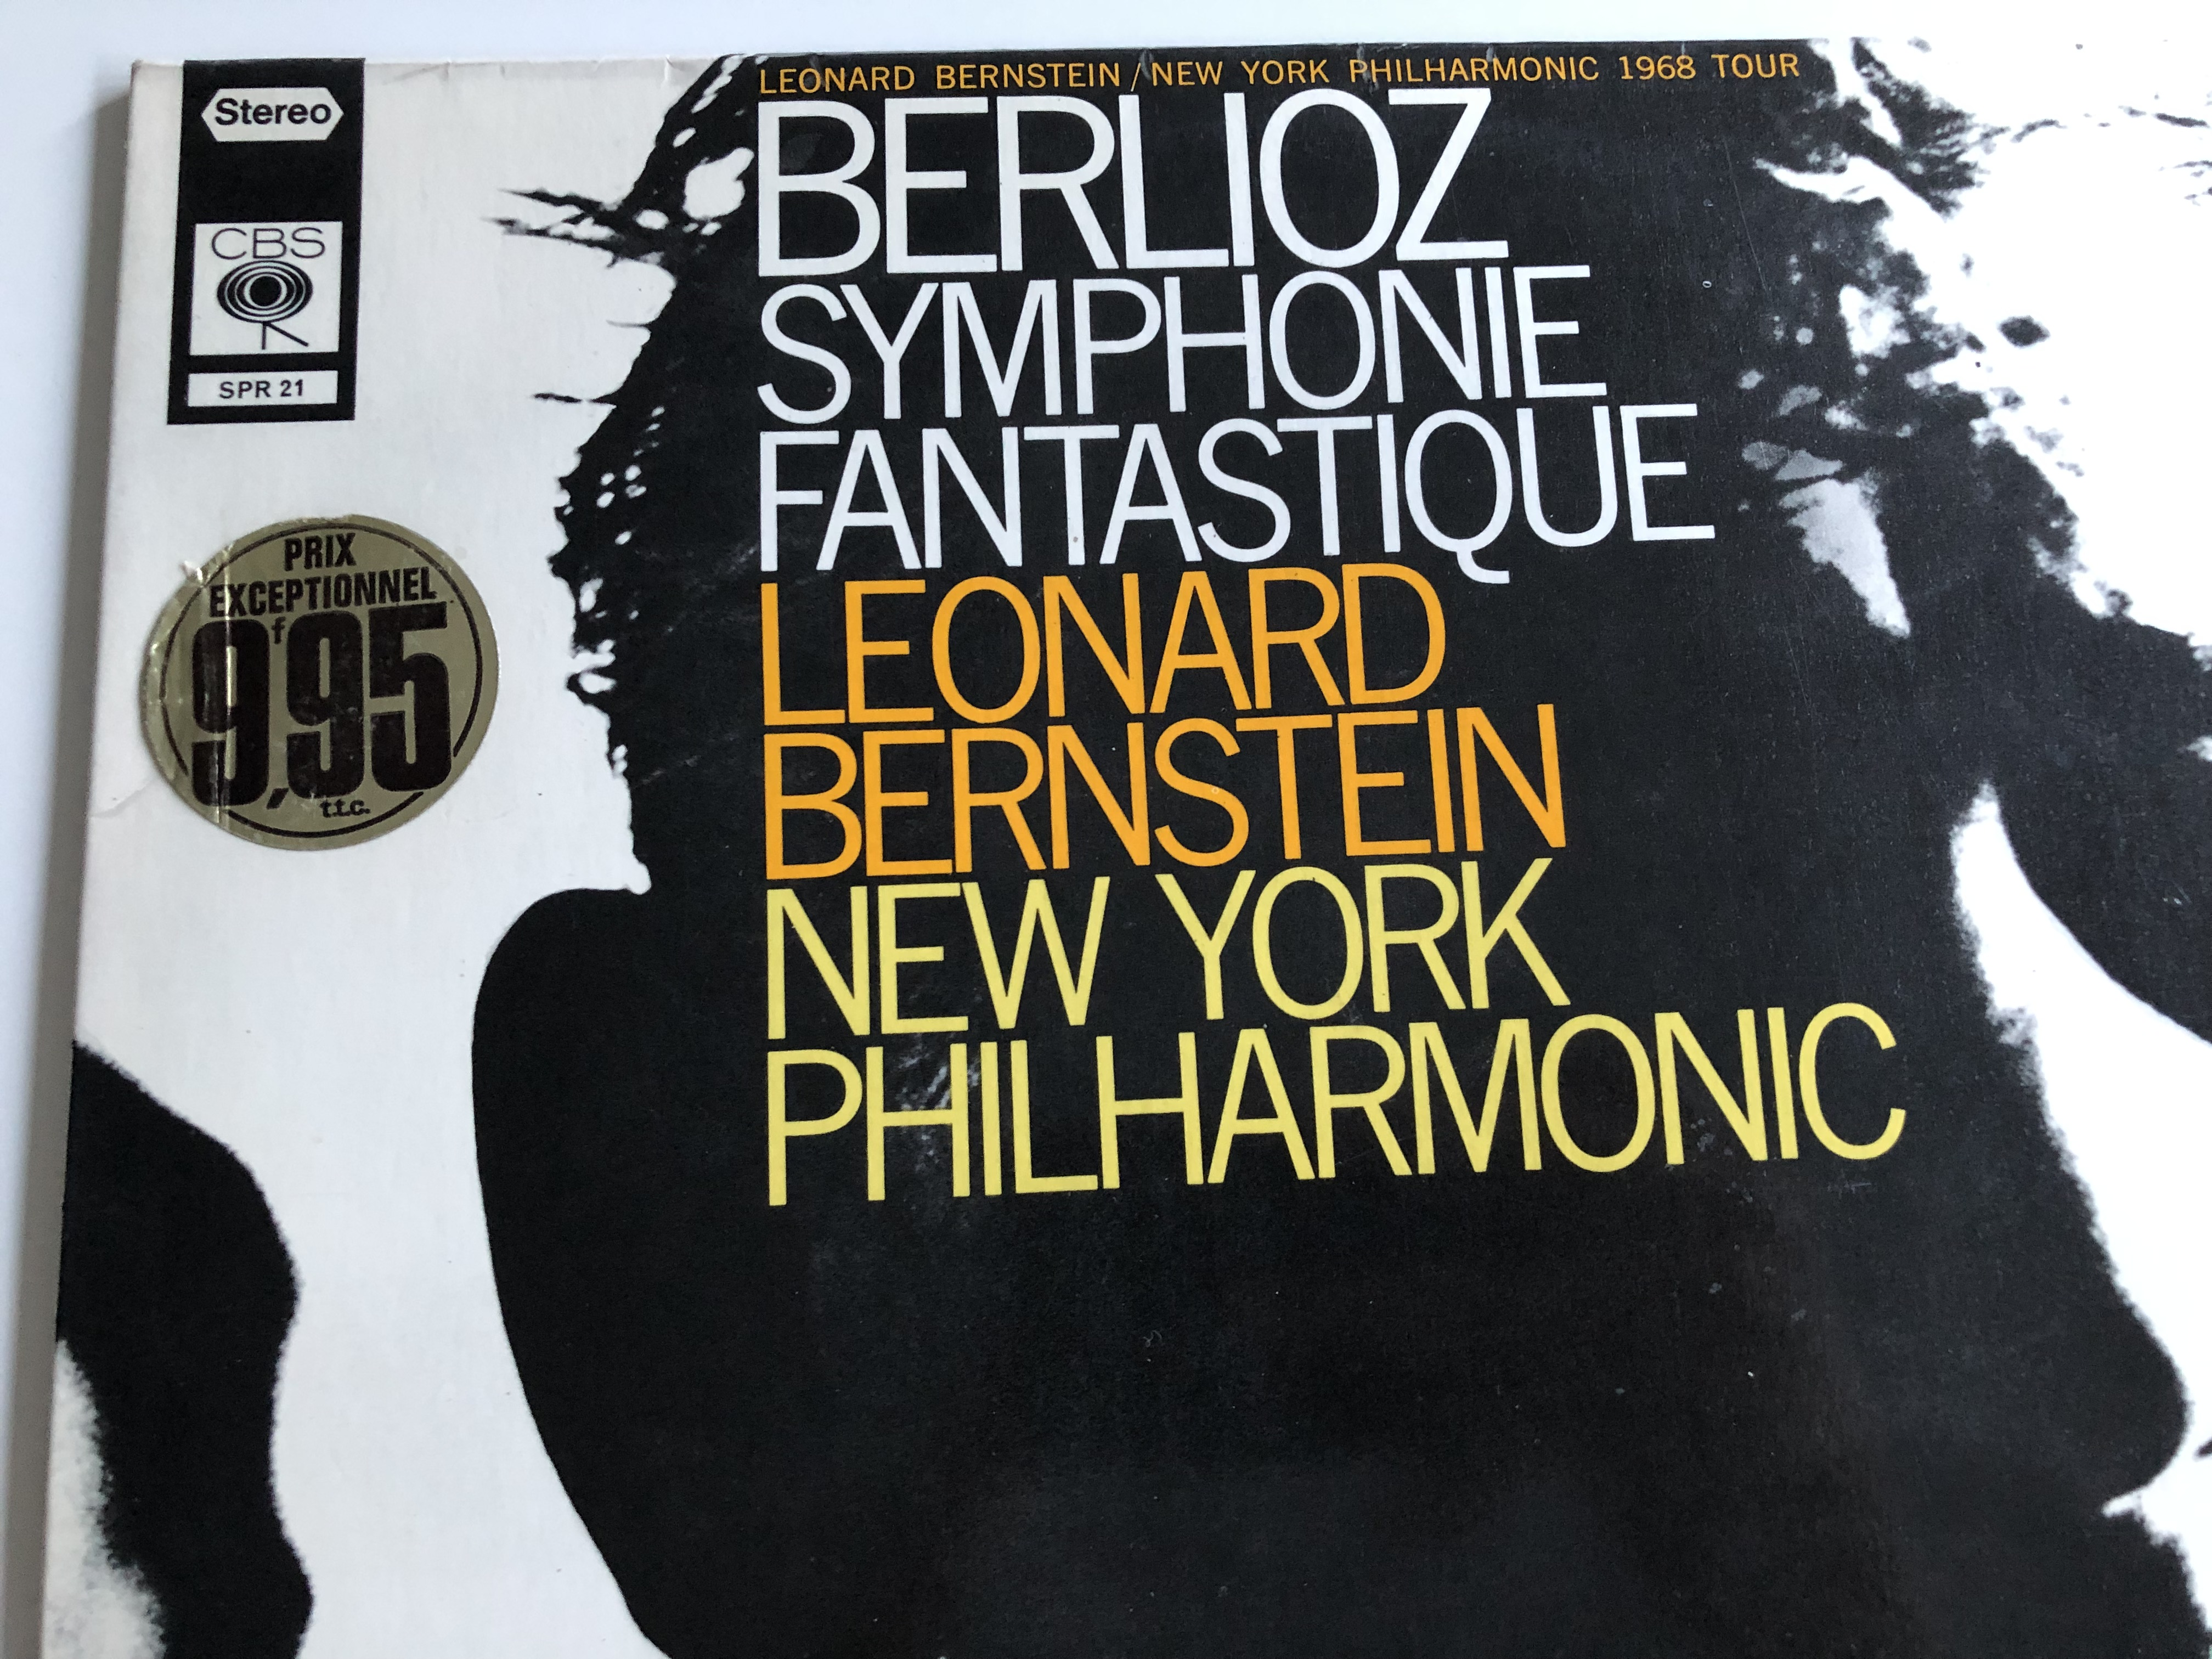 berlioz-symphonie-fantastique-leonard-bernstein-new-york-philharmonic-cbs-lp-stereo-spr-21-3-.jpg